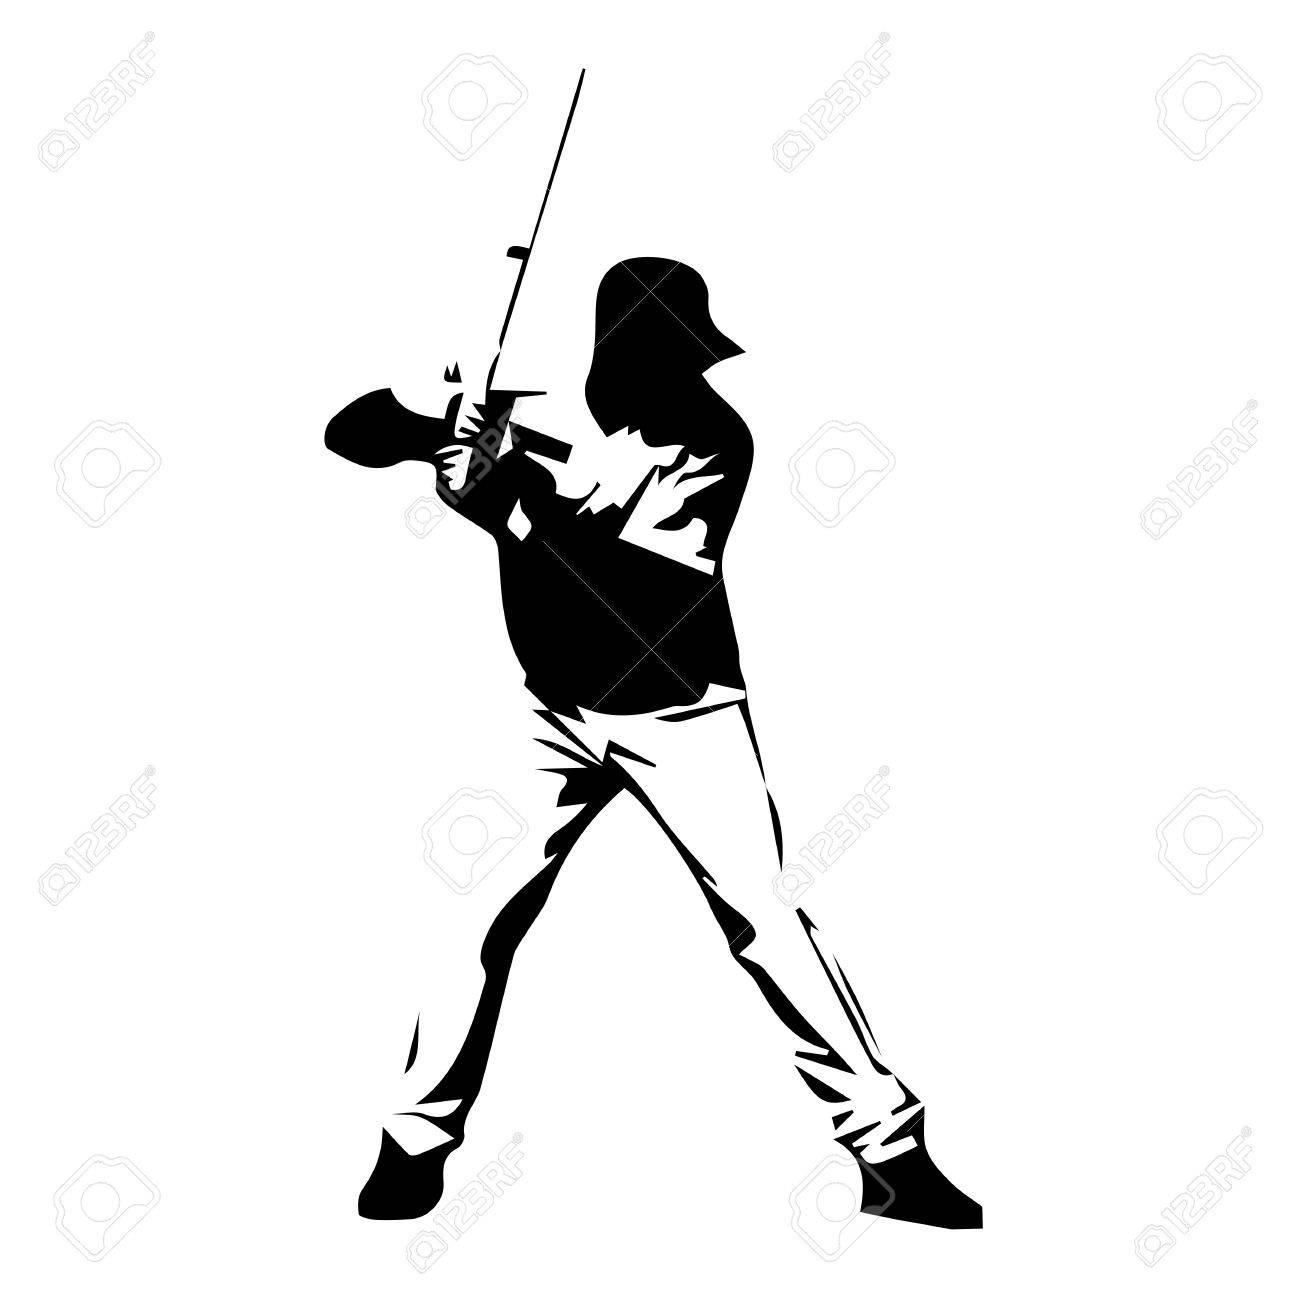 baseball player vector silhouette drawn batter royalty free rh 123rf com Baseball Silhouette Vector Baseball Player Batter Clip Art